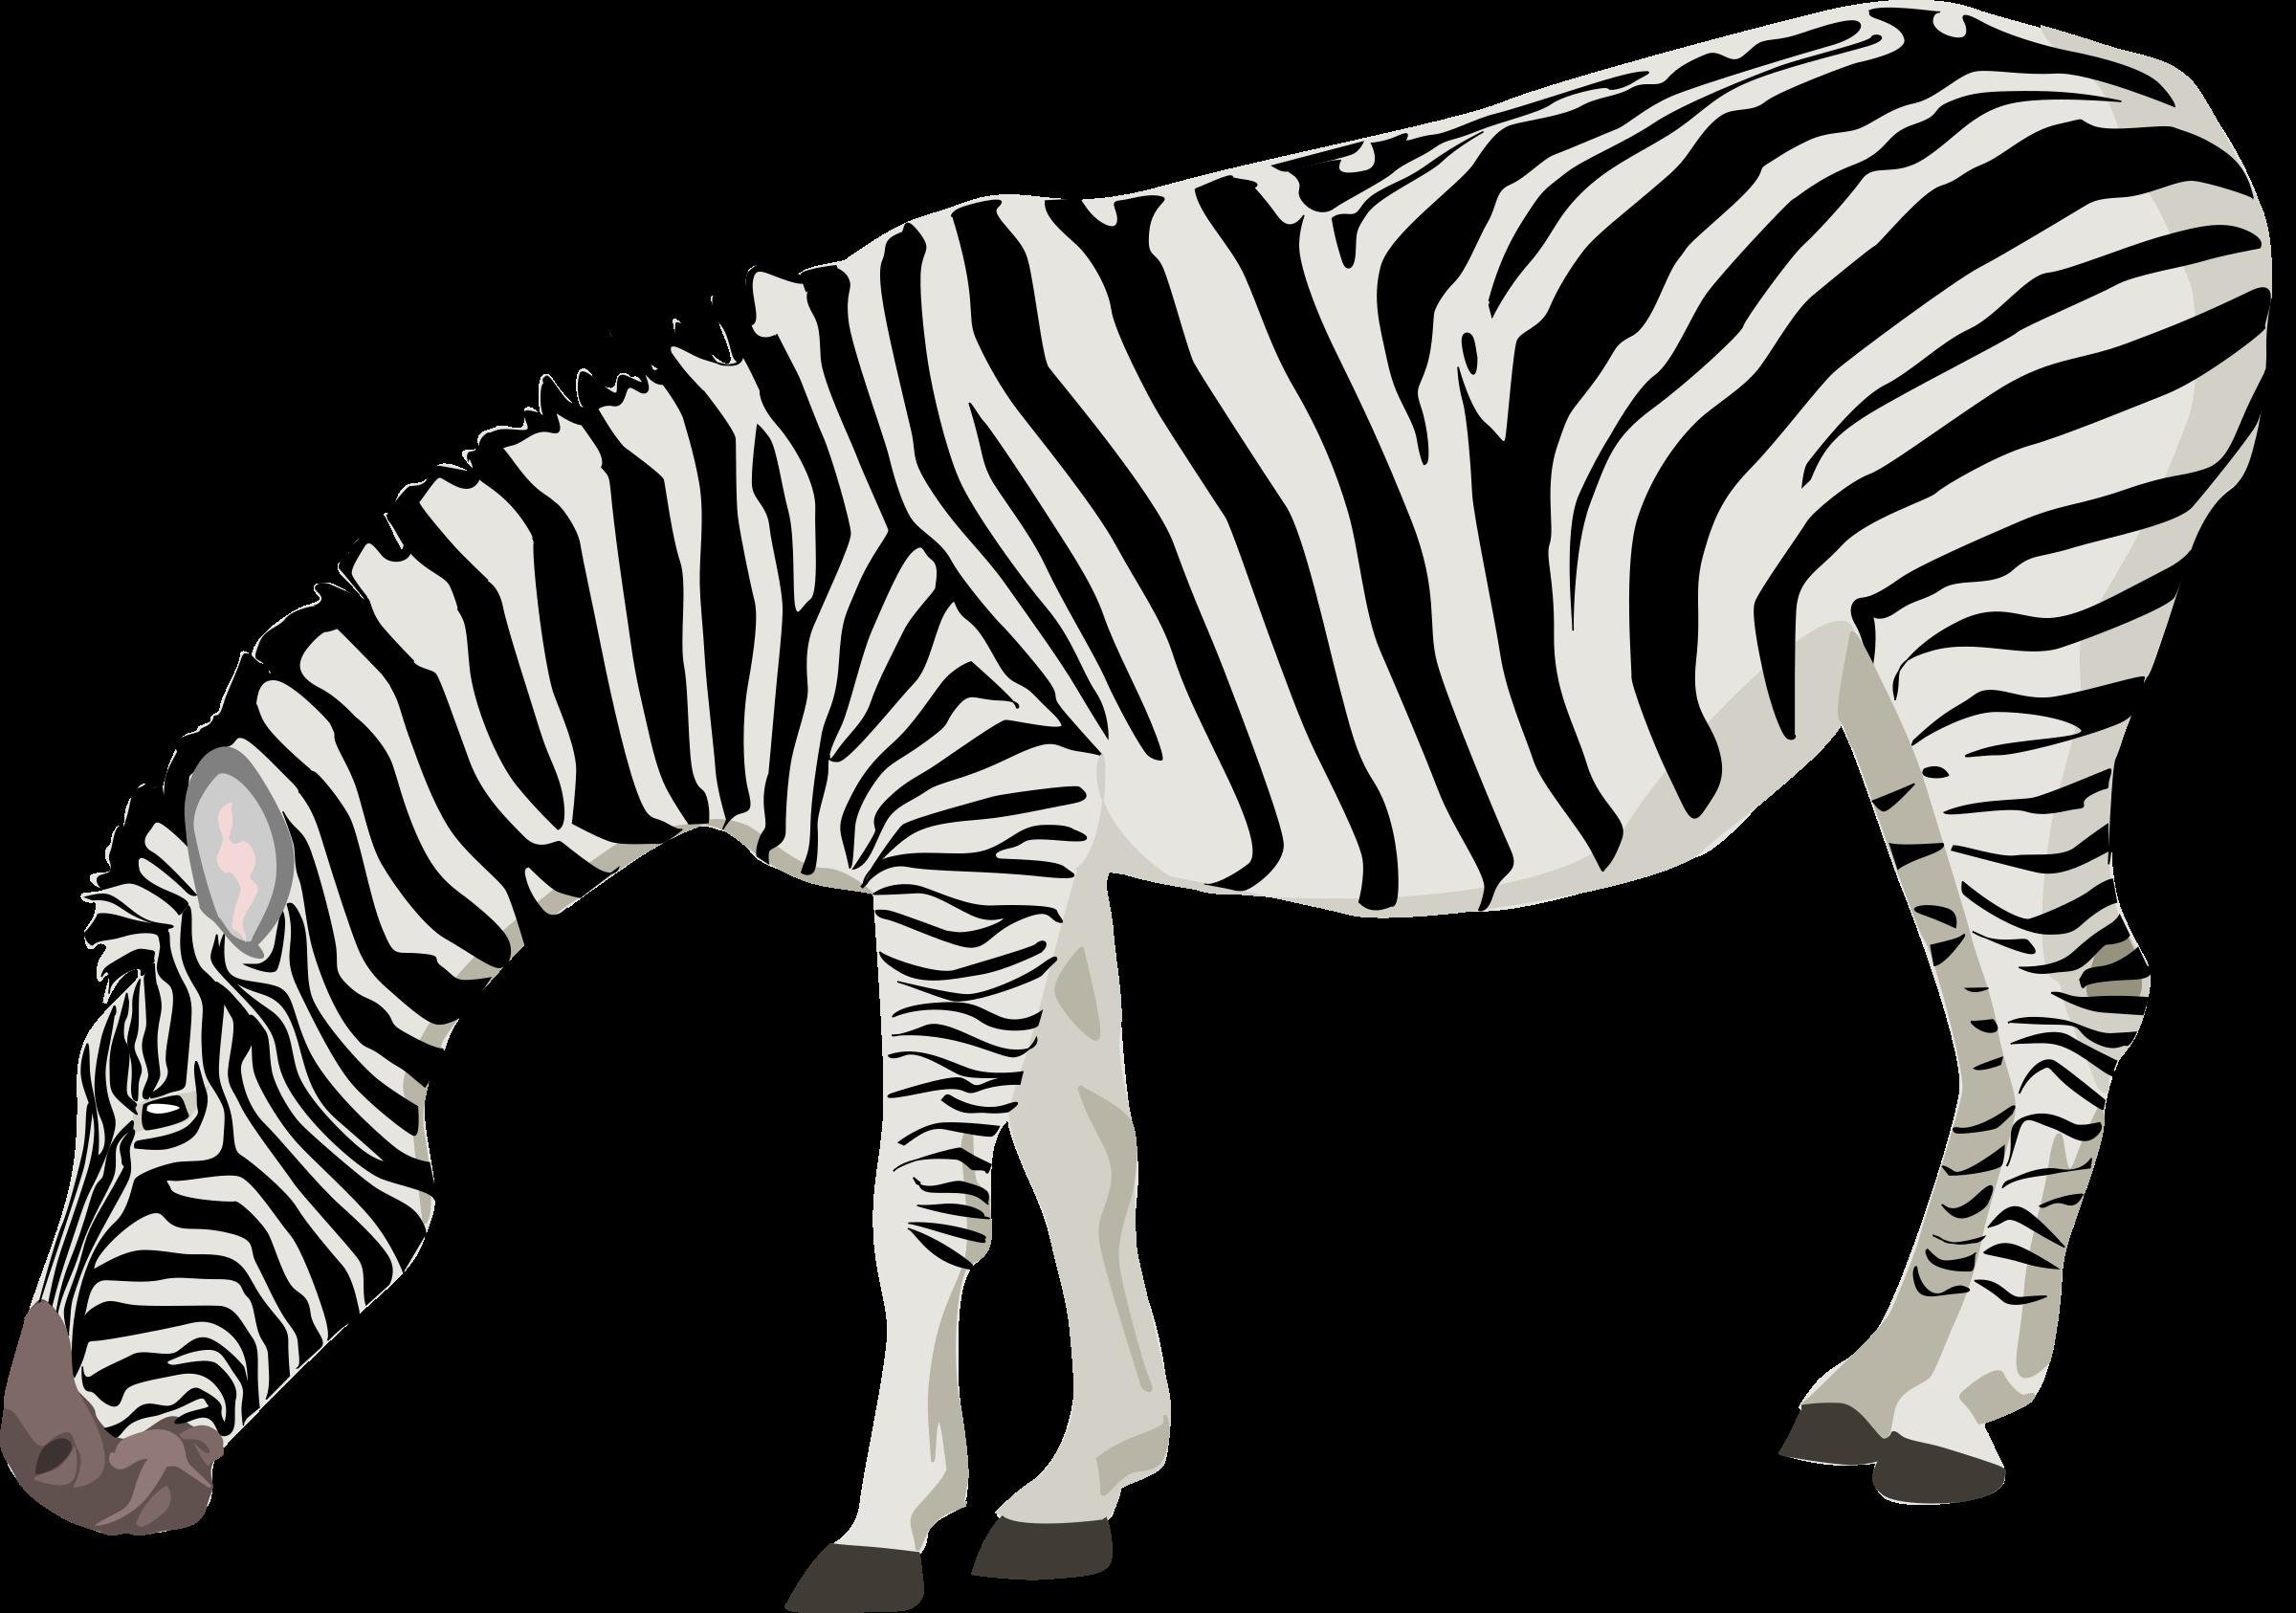 clipart transparent download Zebra clipart. File free on dumielauxepices